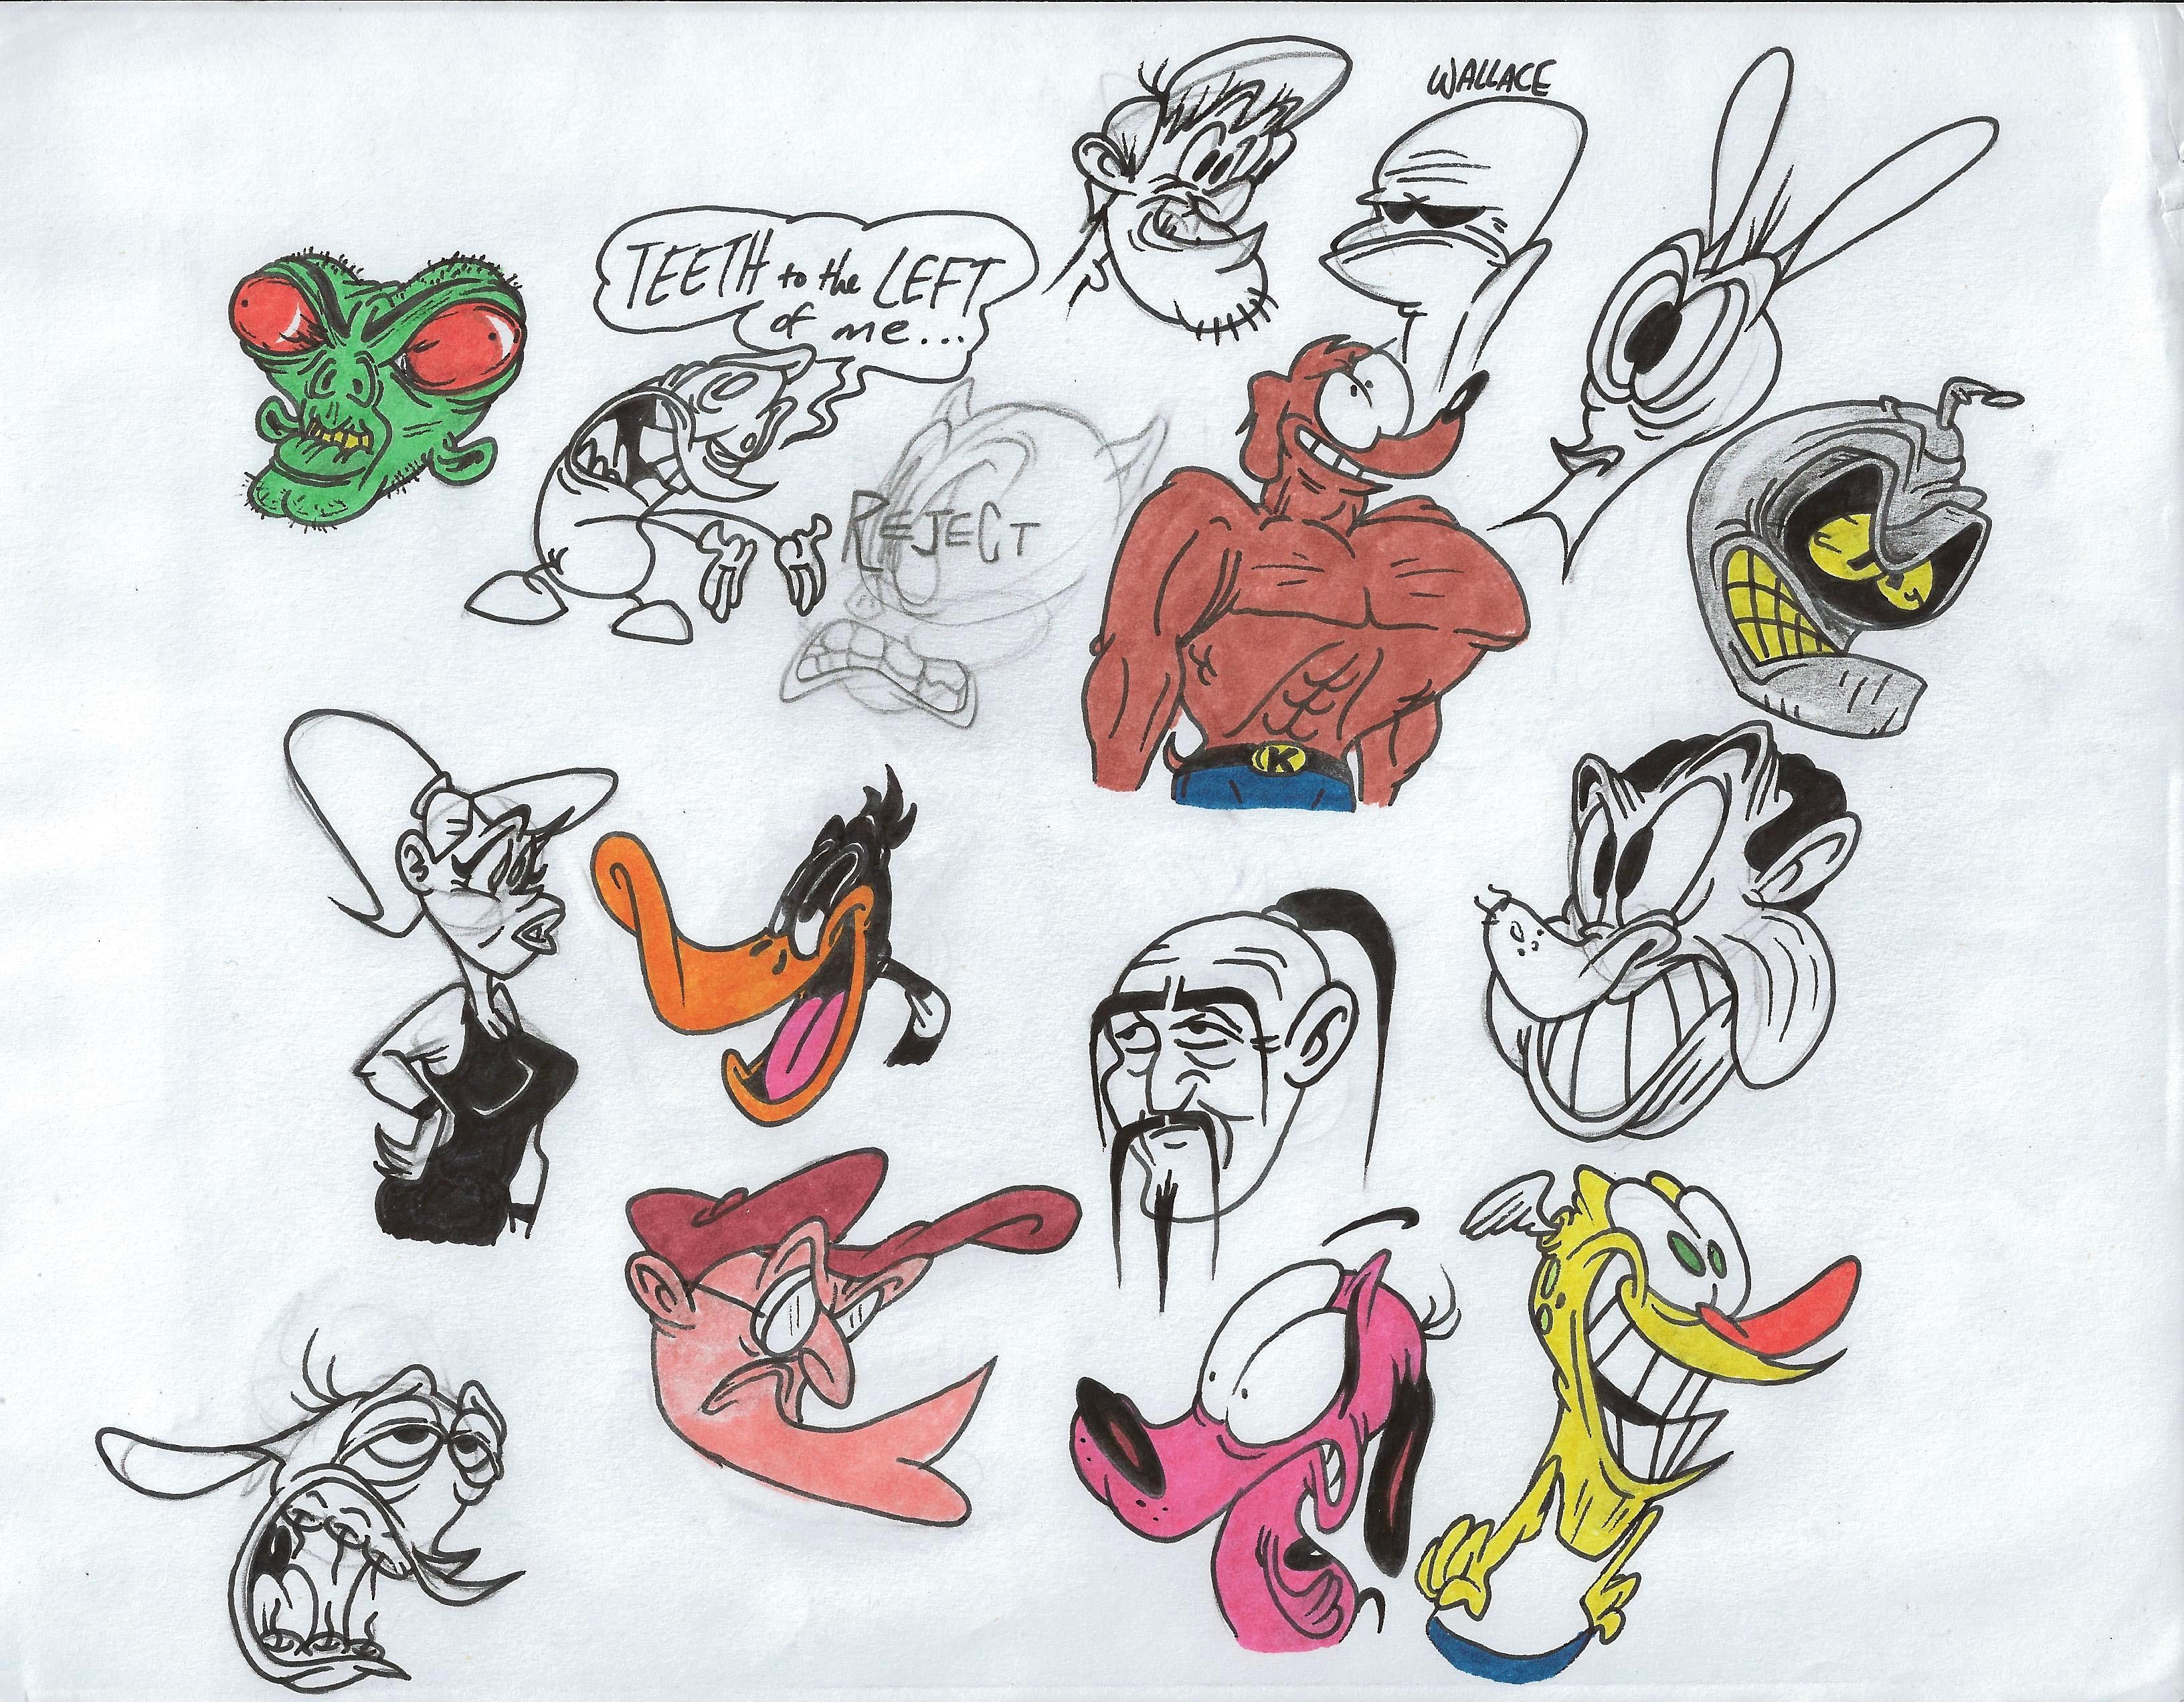 I got bored. by Lotusbandicoot